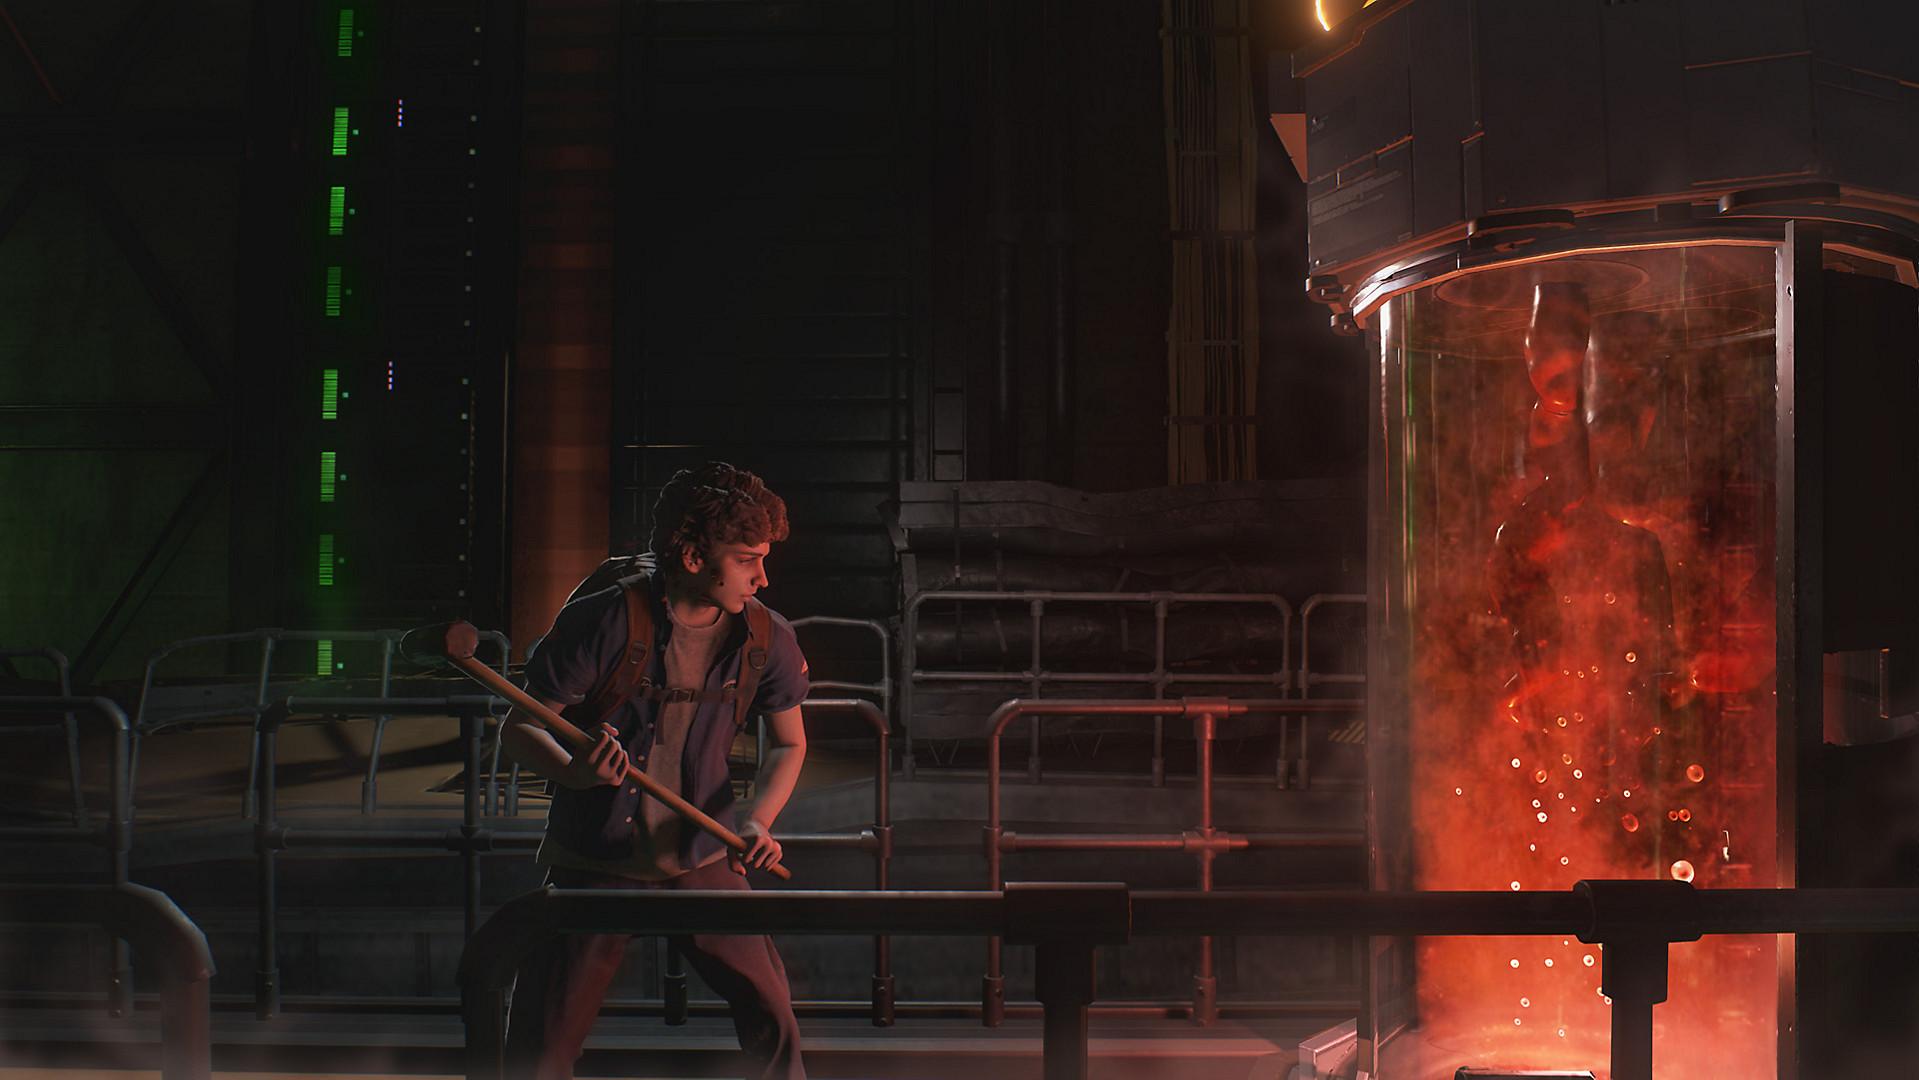 resident-evil-3-resistance-screenshot-02